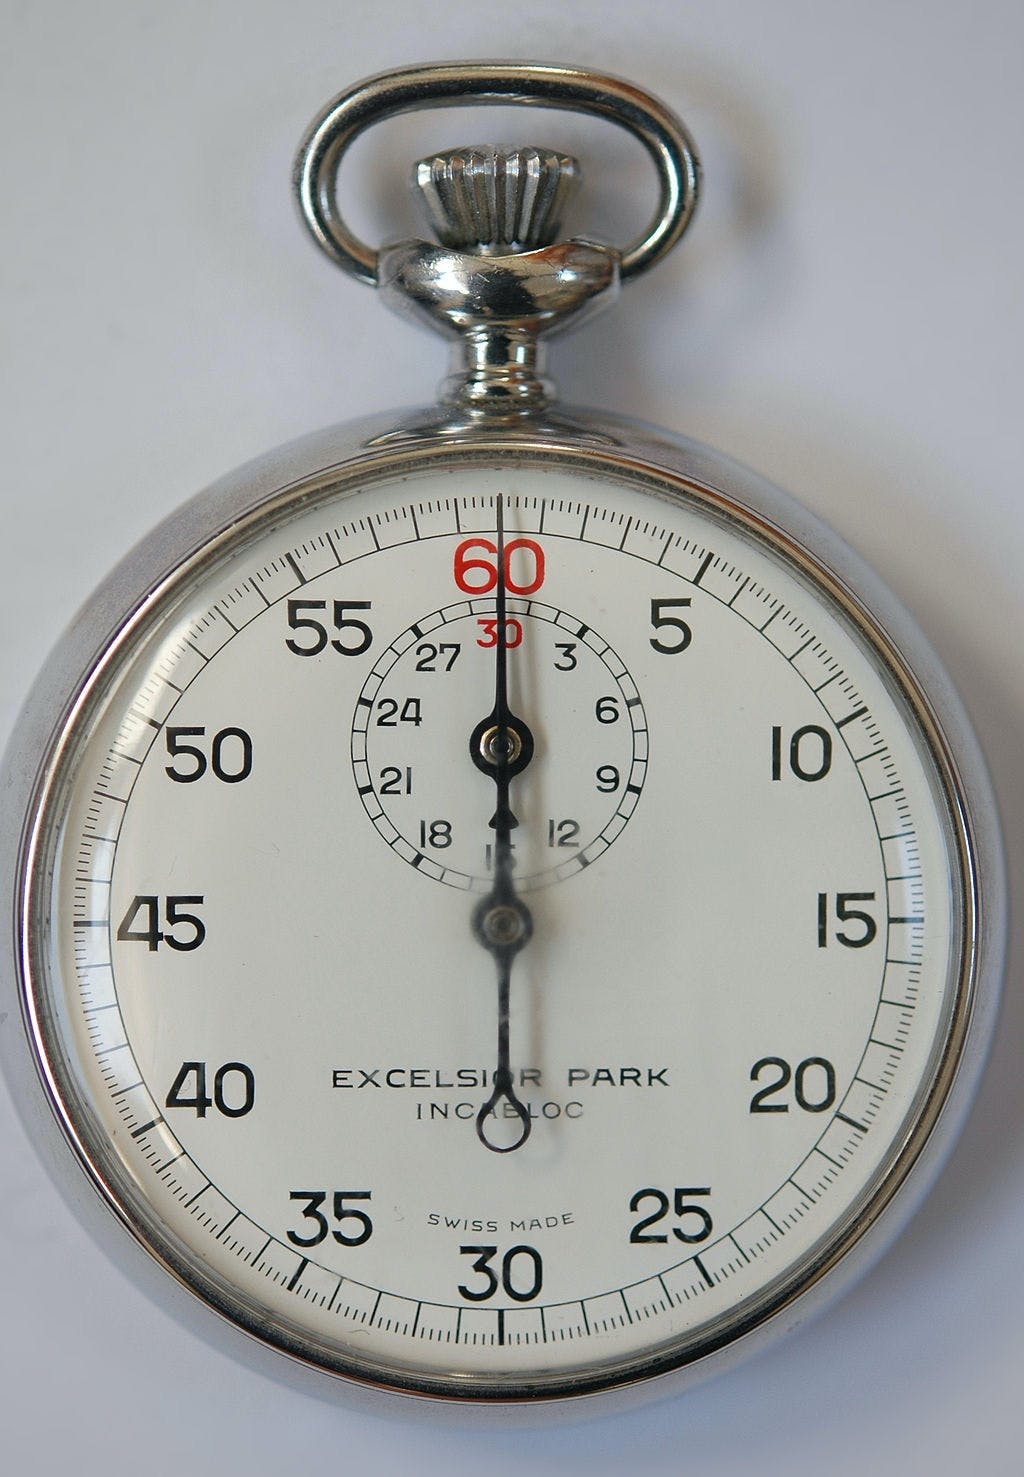 Single-button stopwatch